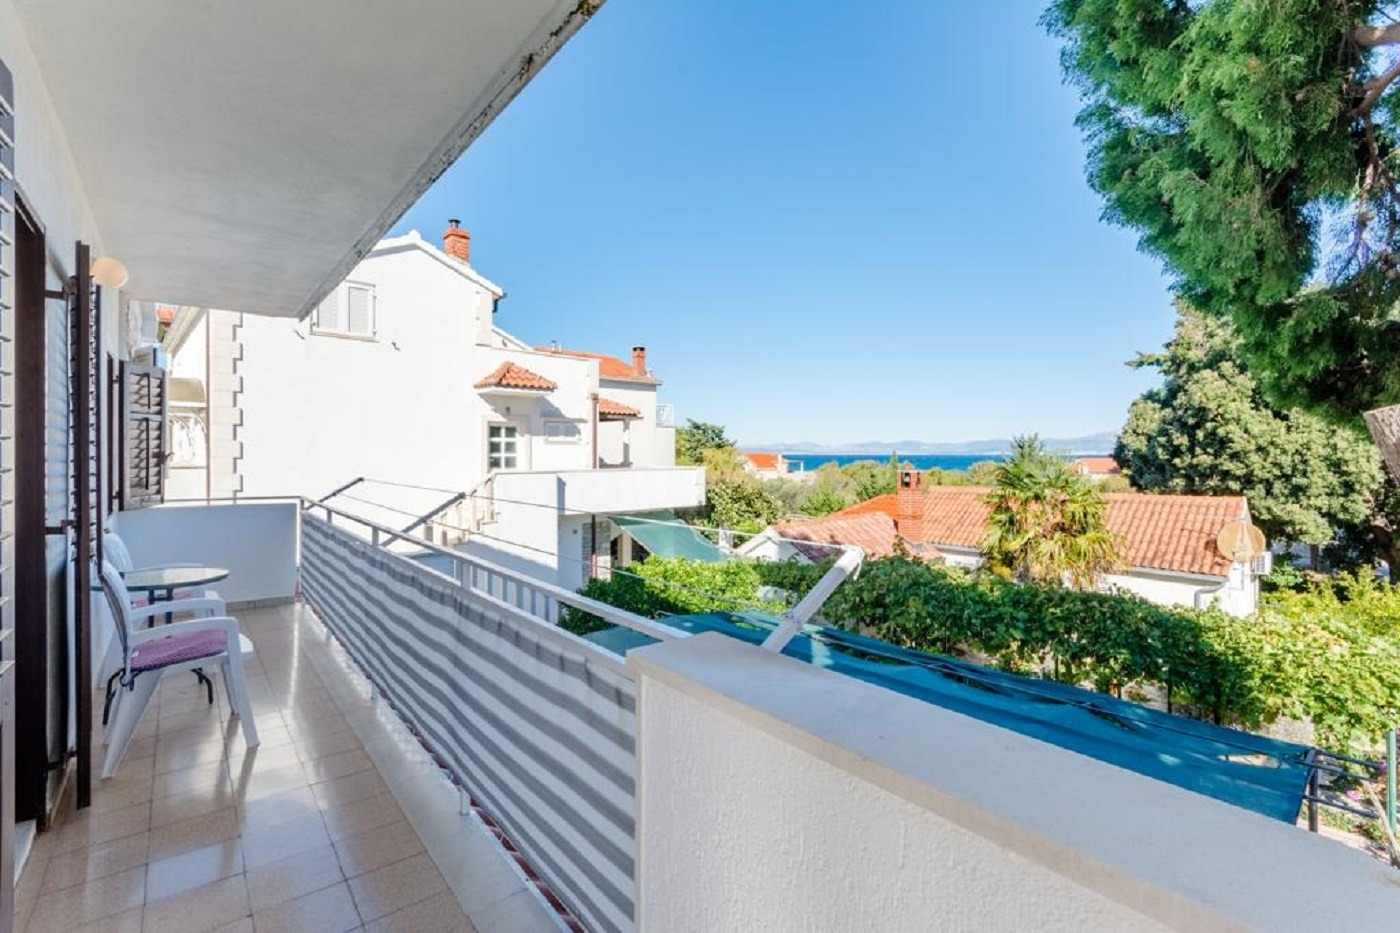 Apartments, Mirca, Island of Brač - Apartments  Matko - 3 Bedrooms Apartment: